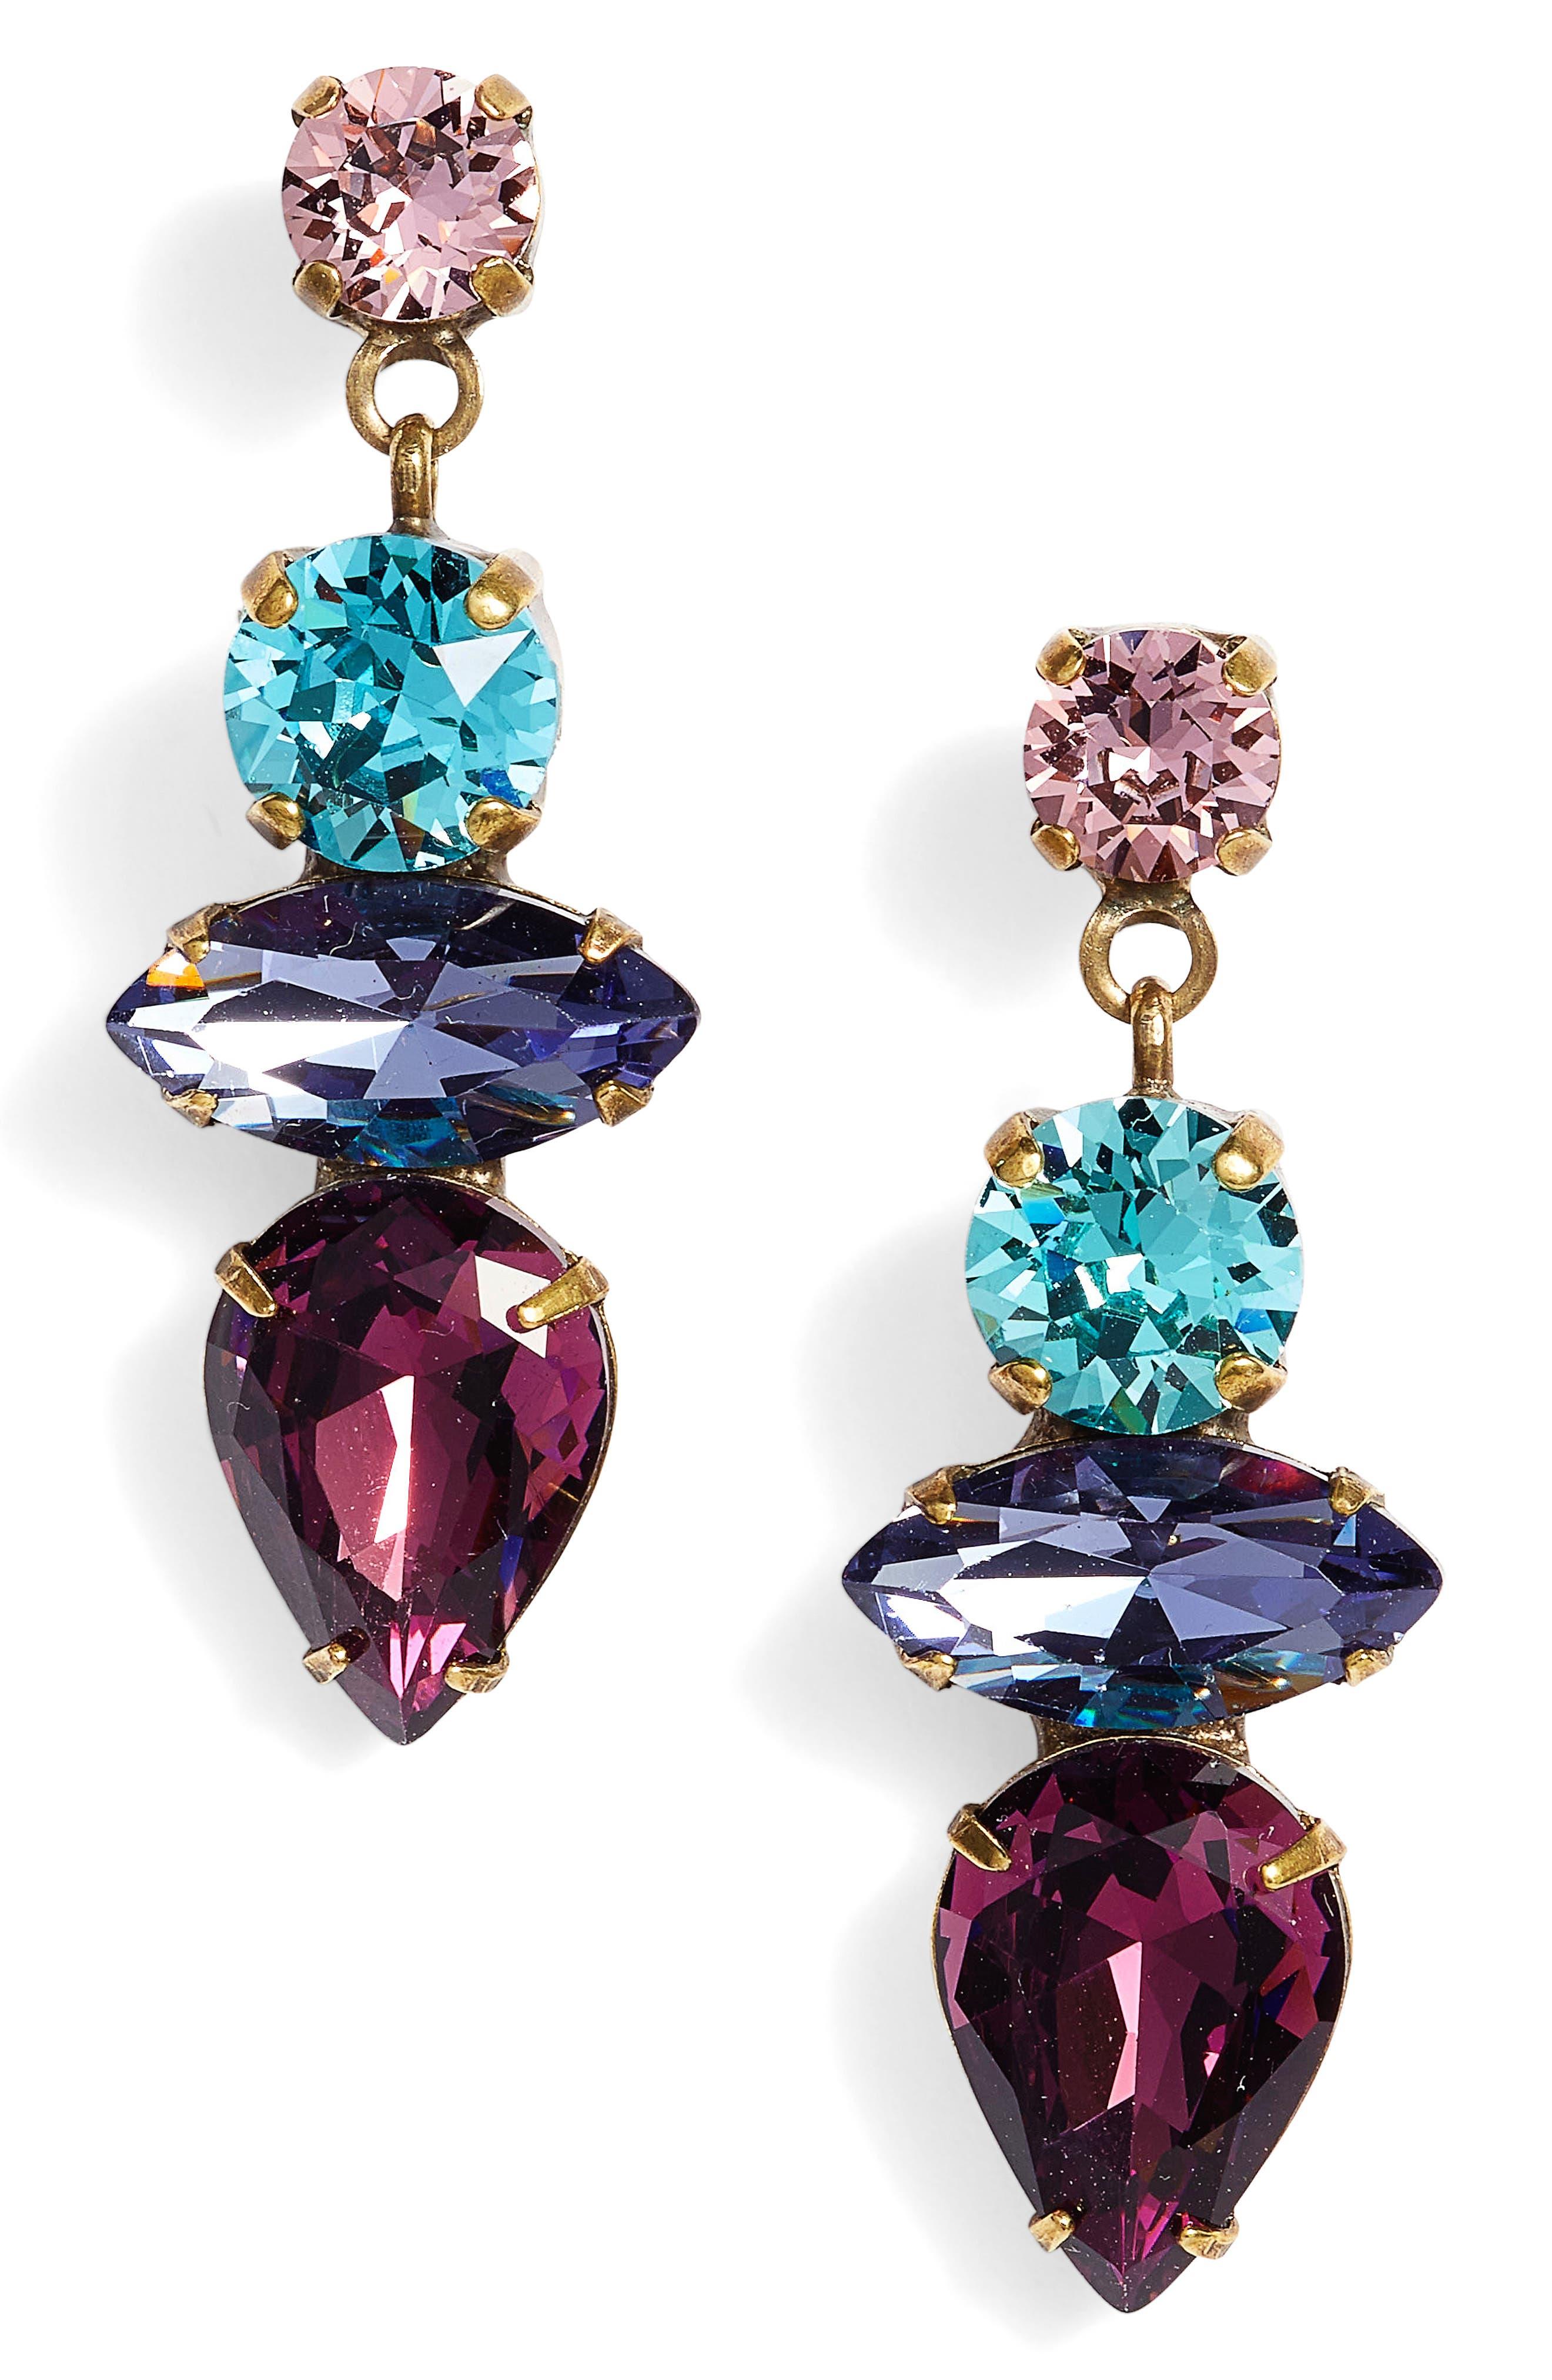 Narcissus Crystal Drop Earrings,                             Main thumbnail 1, color,                             710